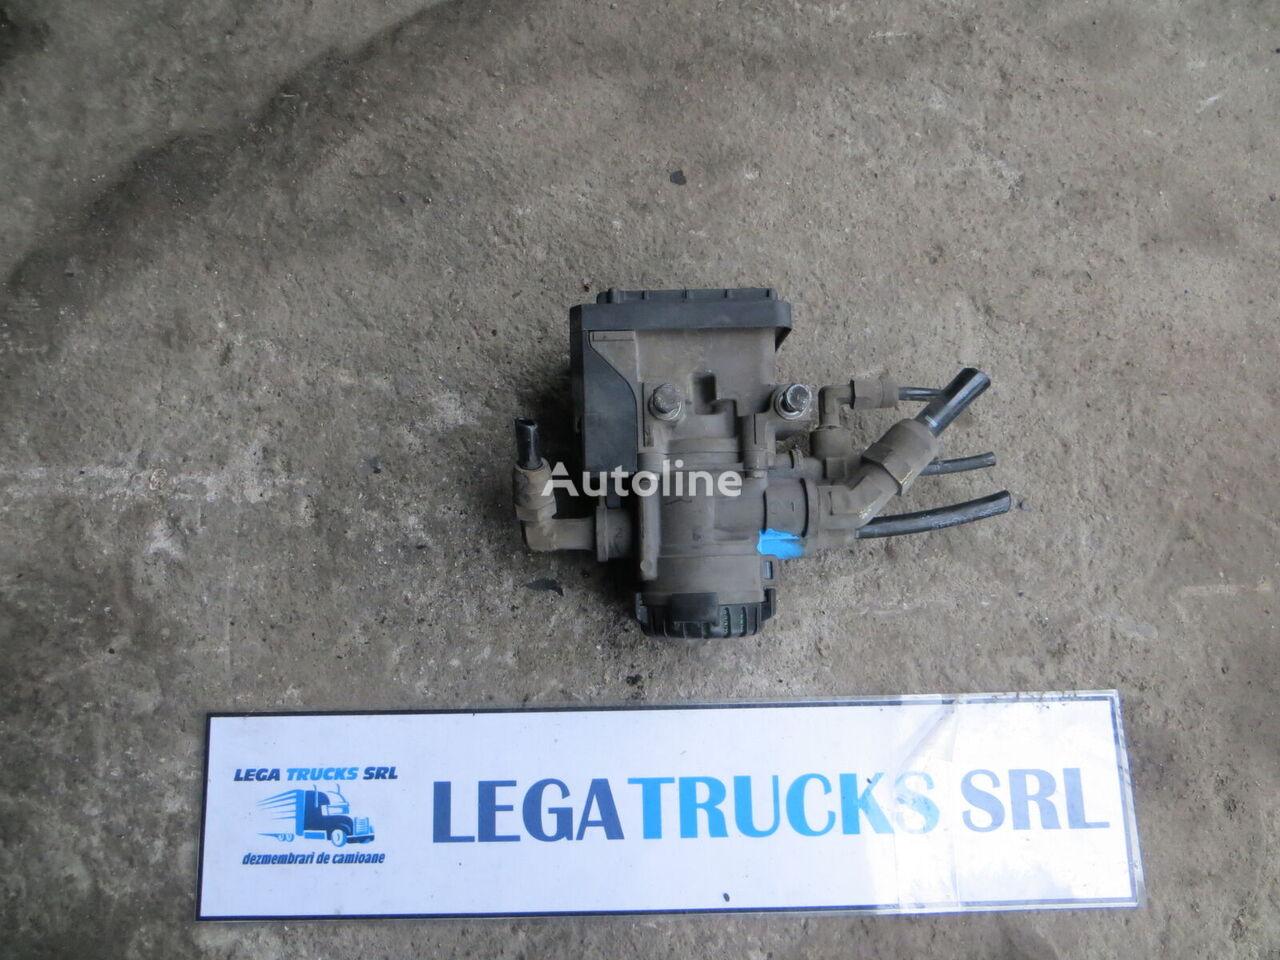 SCANIA Supapa EBS Axa Fata (Supapa Modulator EBS) R Euro 5 1879275 pneumatic valve for tractor unit